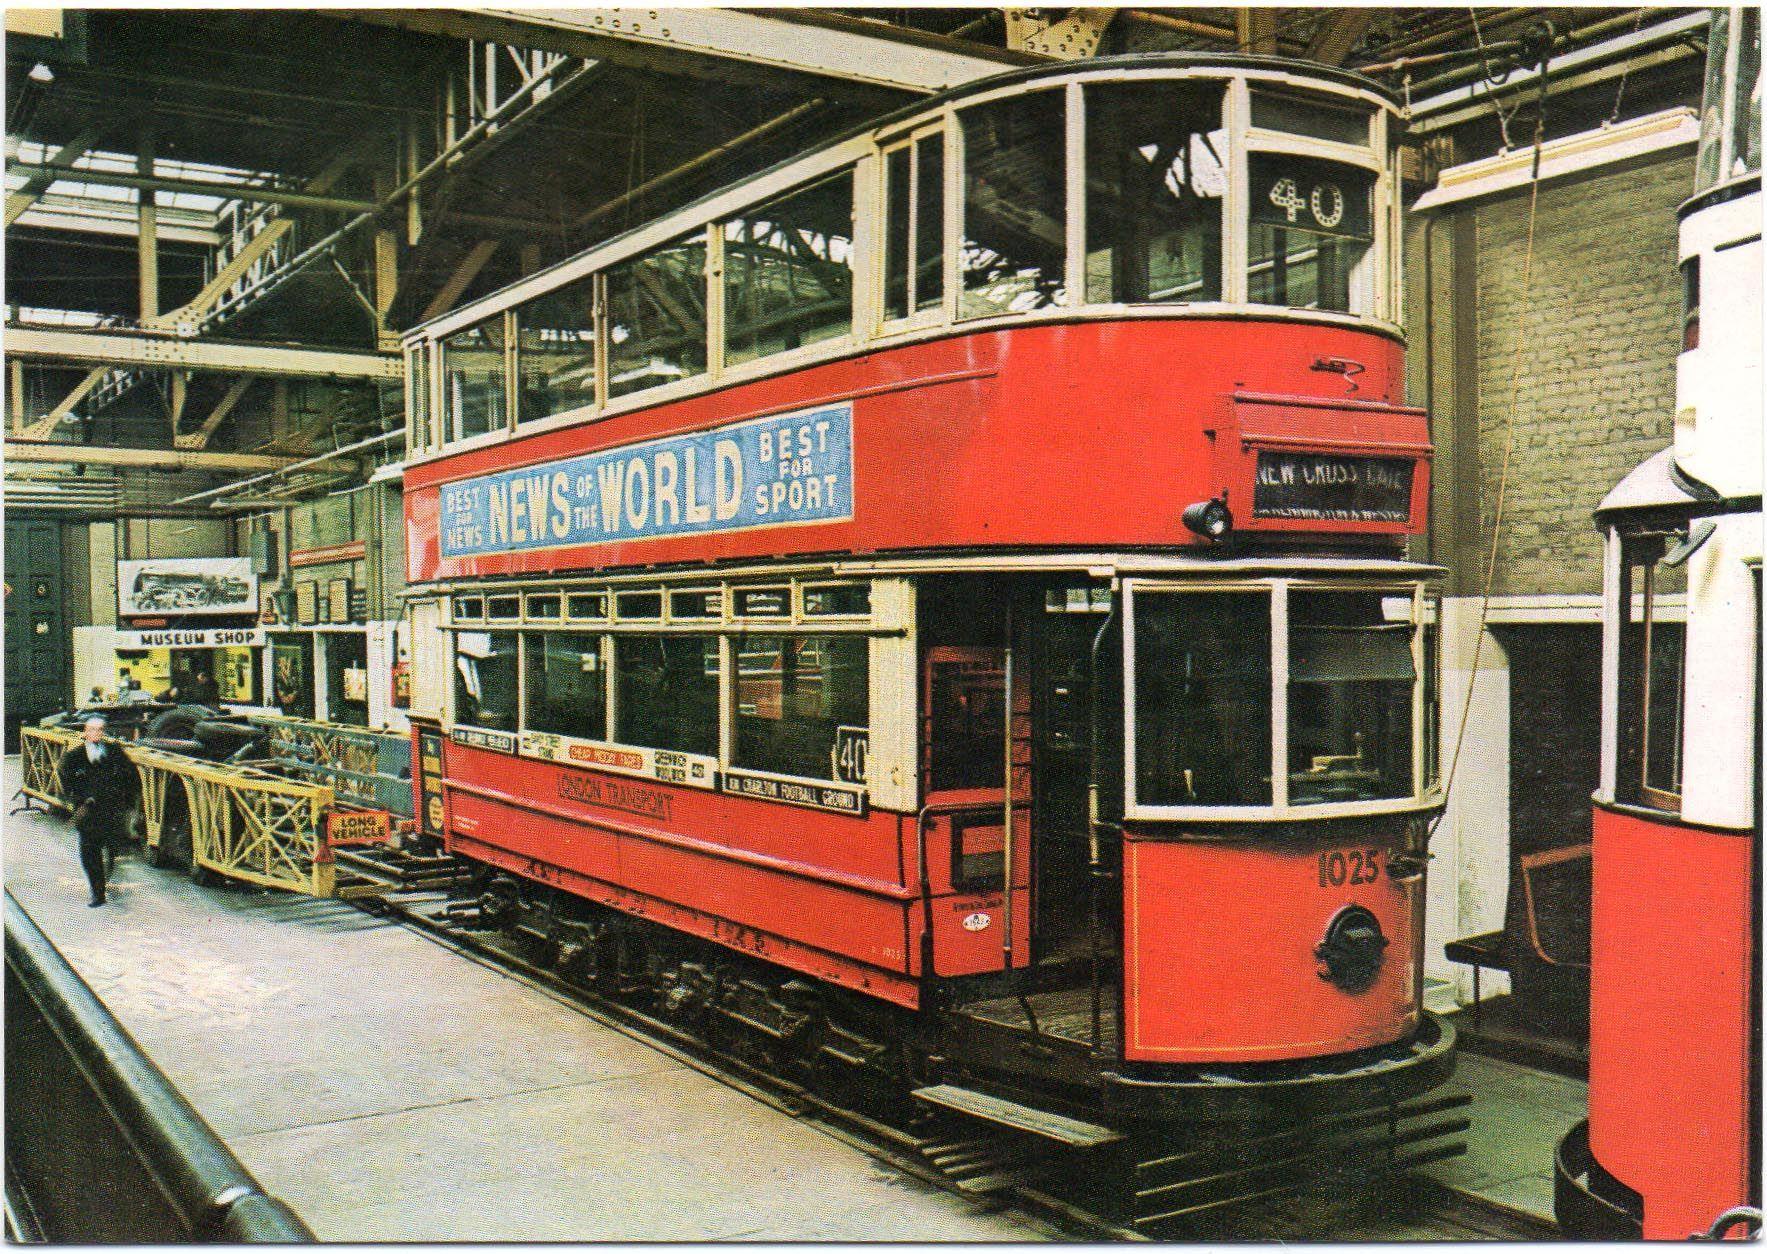 TRAMS BUSES POSTCARD LONDON TRANSPORT MUSEUM TRAINS